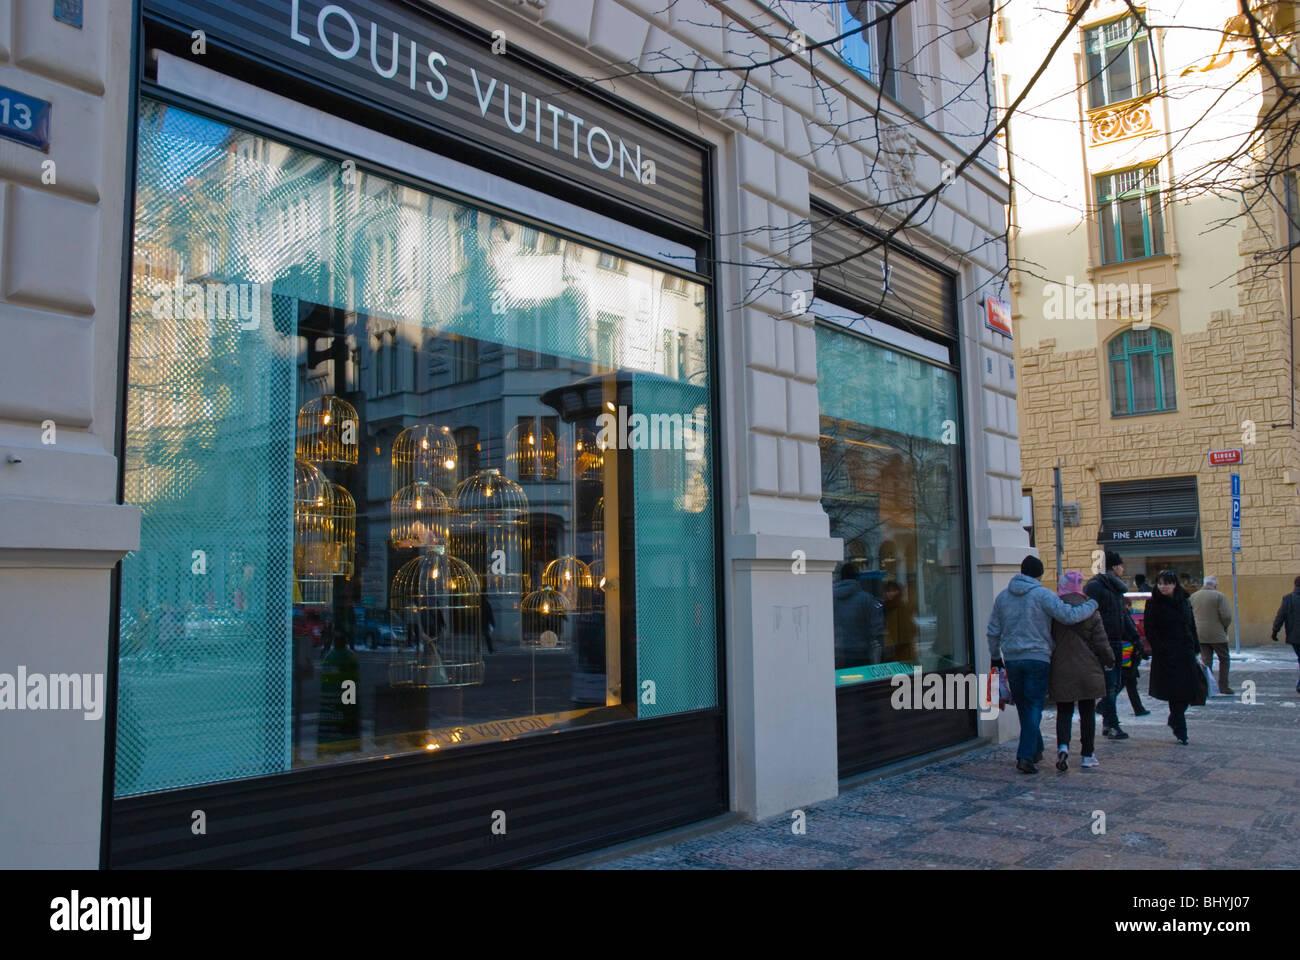 Louis vuitton shop parizska street josefov central prague for Central prague